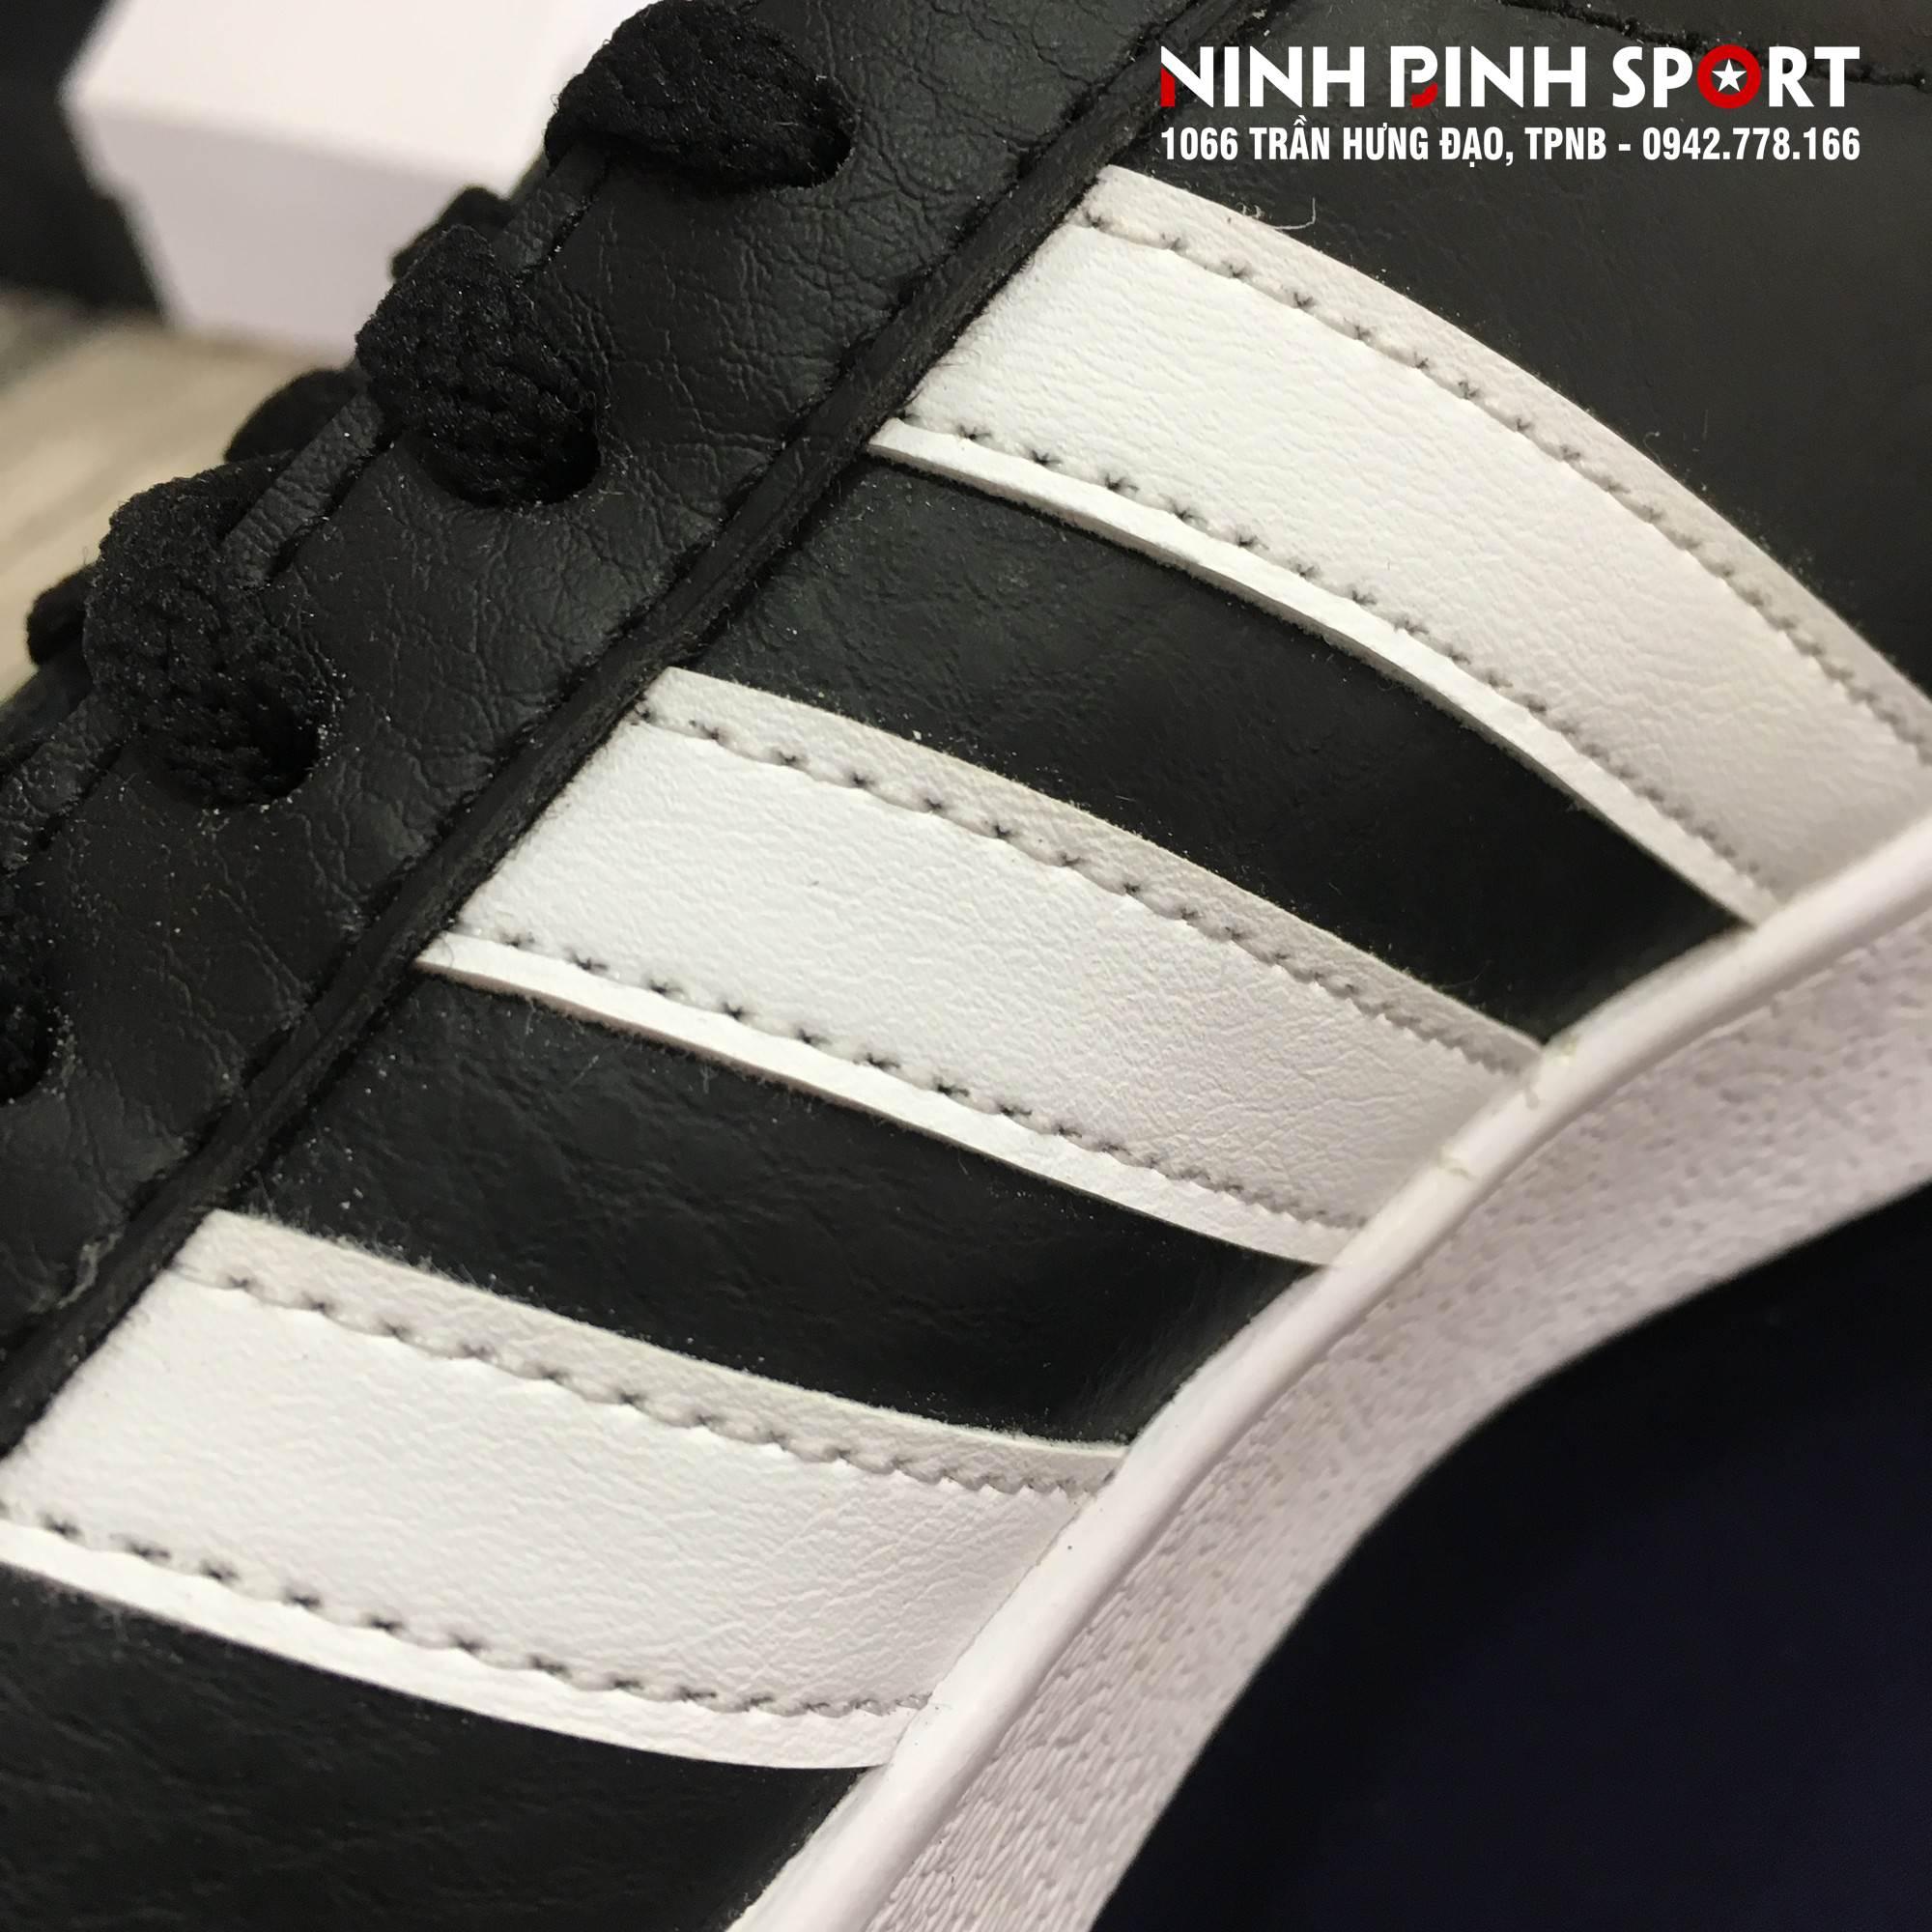 Giầy thể thao nam Adidas Neo VL COURT 2.0 B43814